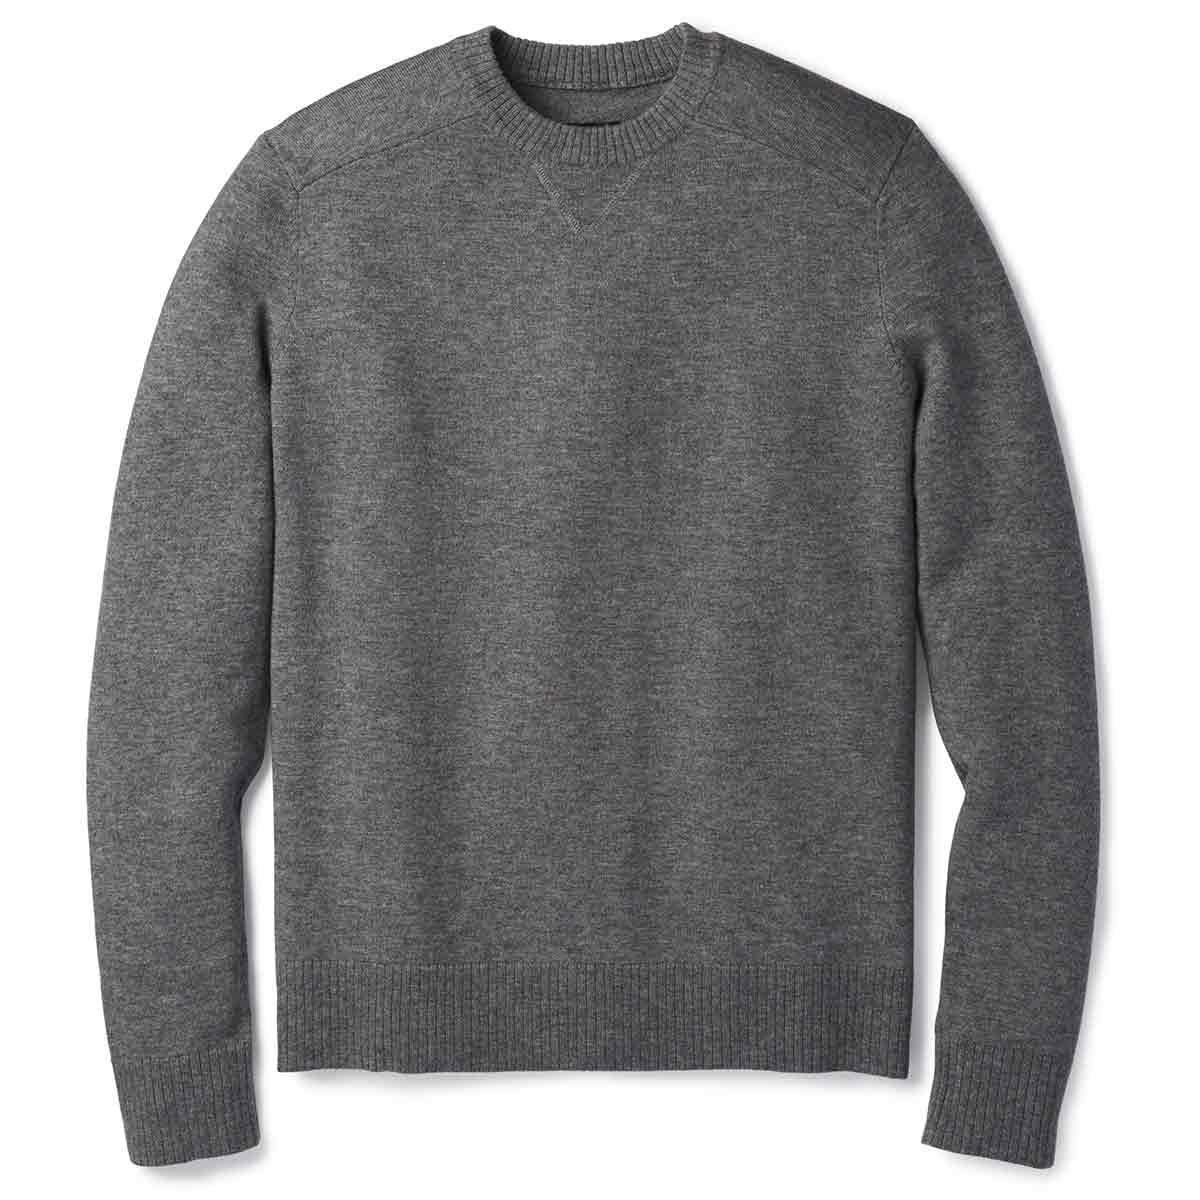 Smartwool Men's Sparwood Crew Sweater - Black, XL